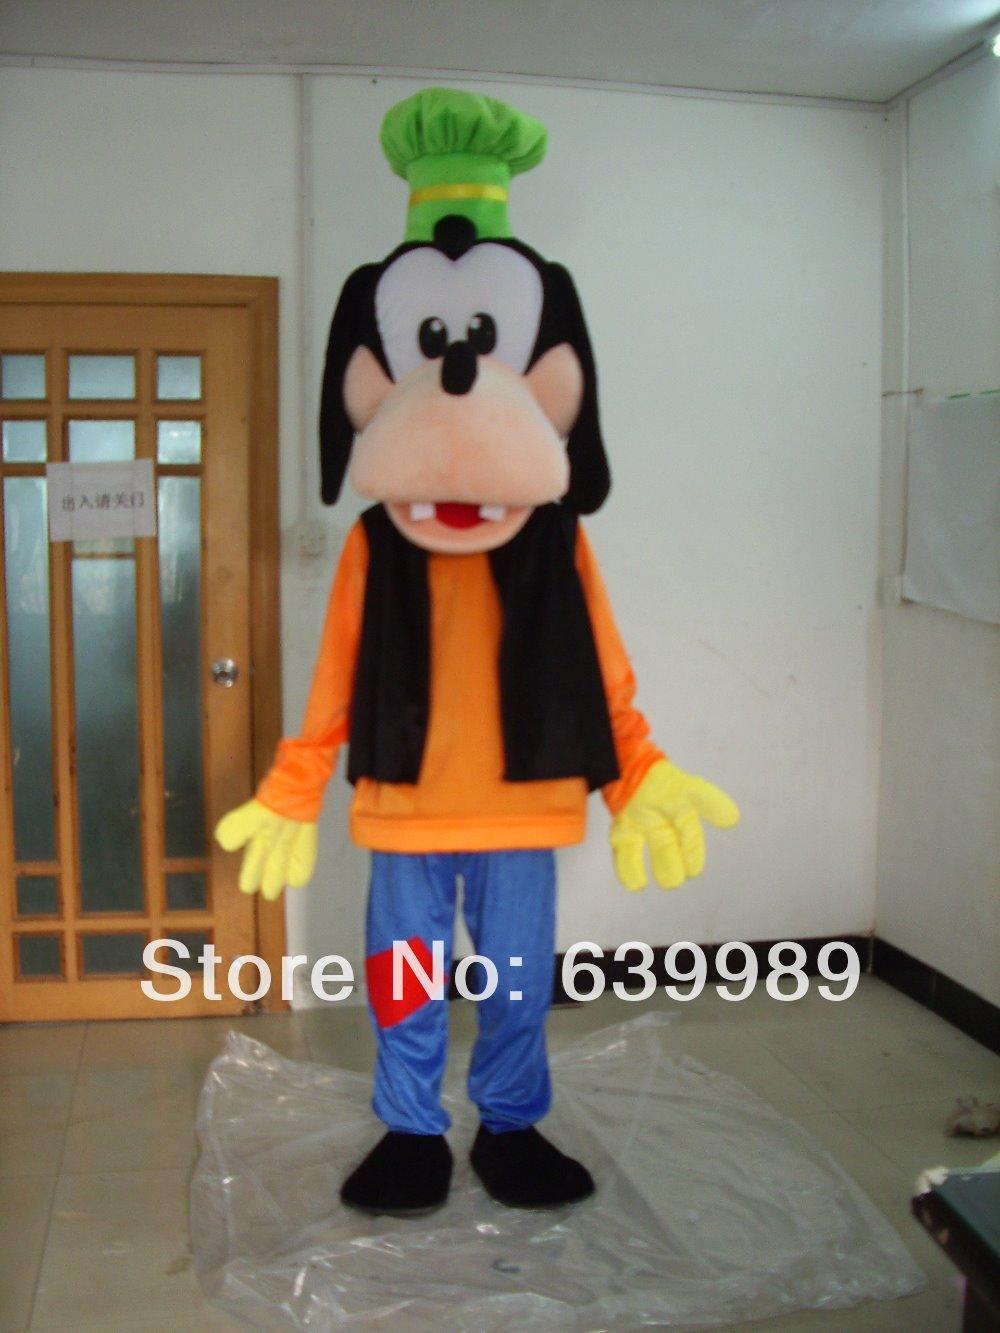 POLE STAR MASCOT COSTUMES quality polyfoam hot sale new dog goofy mascot costumes 2014 hot sale goofy dog mascot costume goofy(China (Mainland))